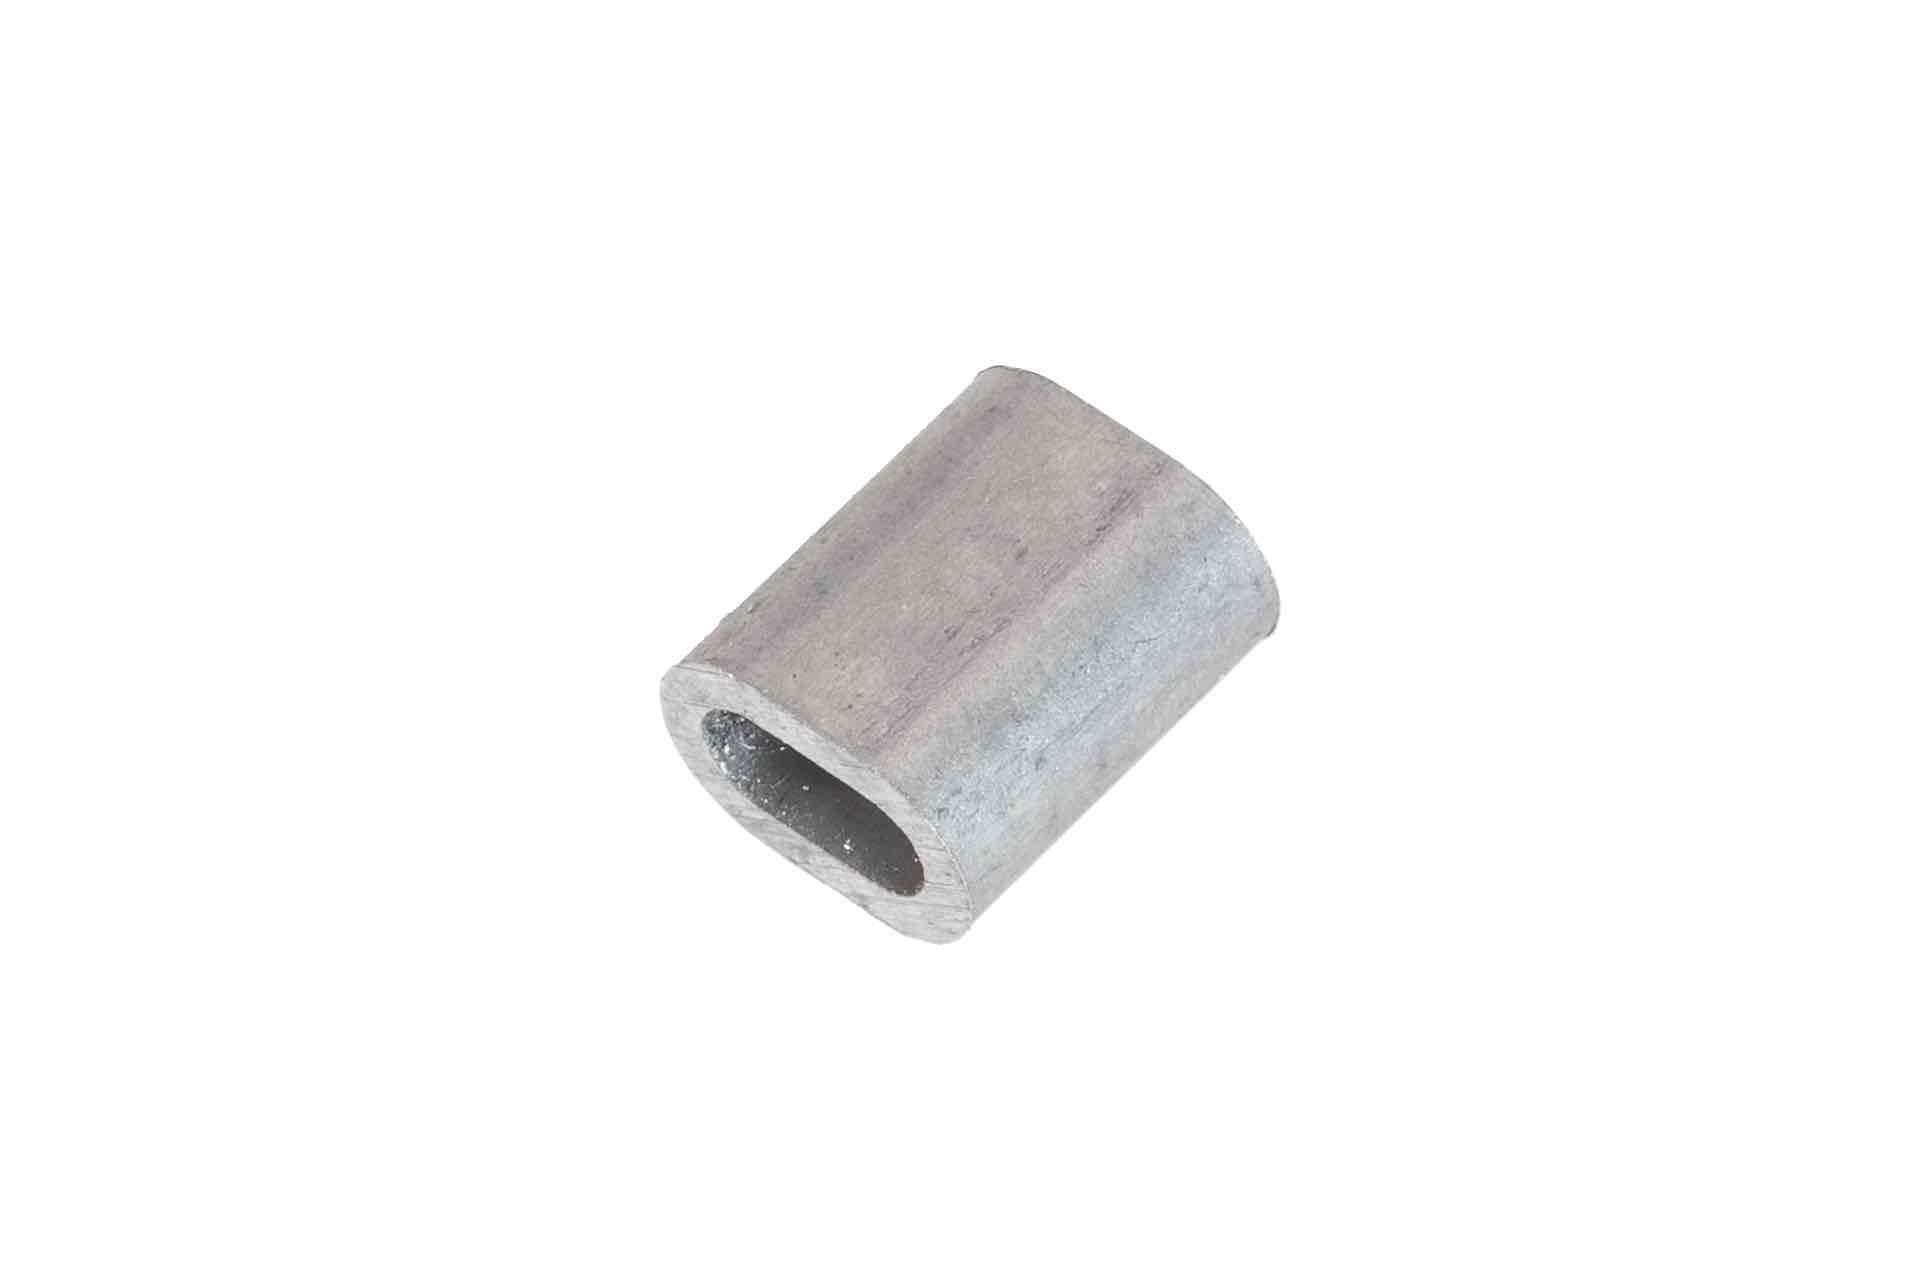 Knijphuls 2,5mm aluminium